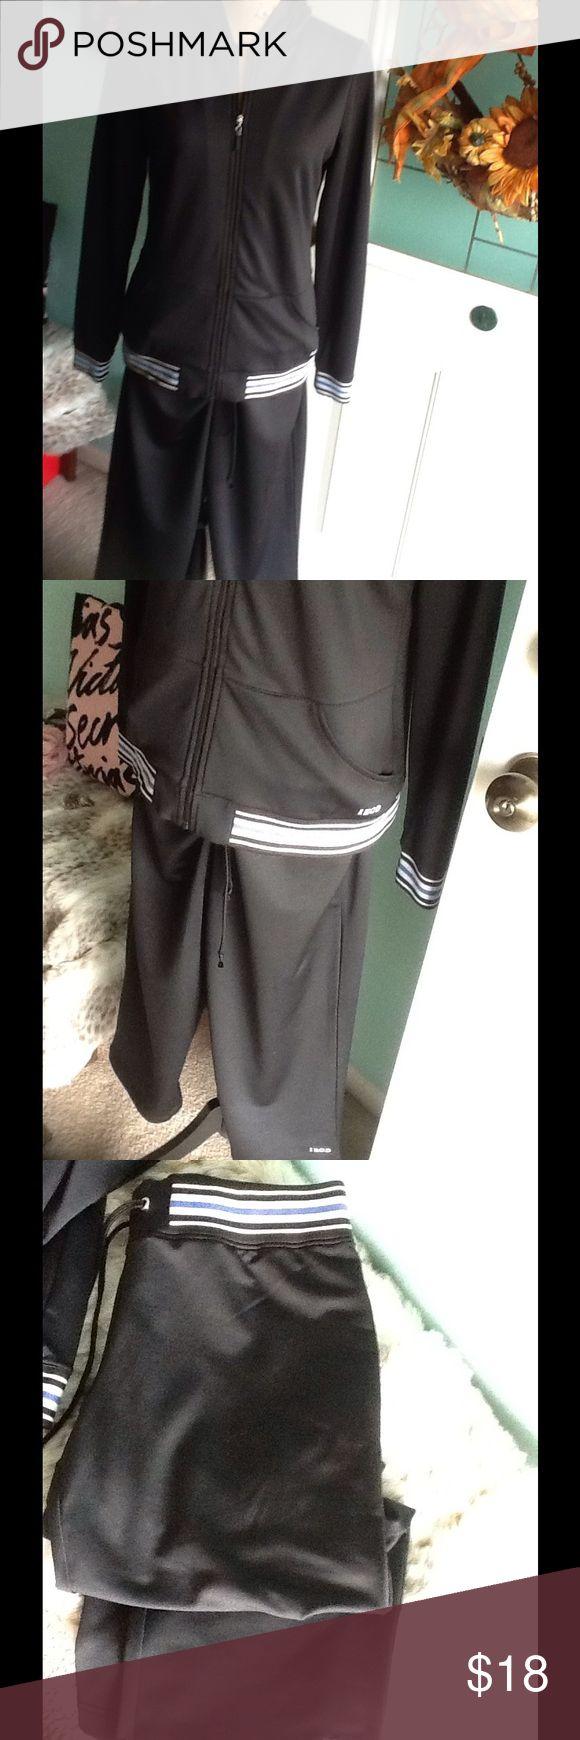 Izod track suit Zip up hoodie and Capri w/elastic,drawstring waist.black,w/blue and white trim,and blue logo.Like new. Izod Pants Track Pants & Joggers